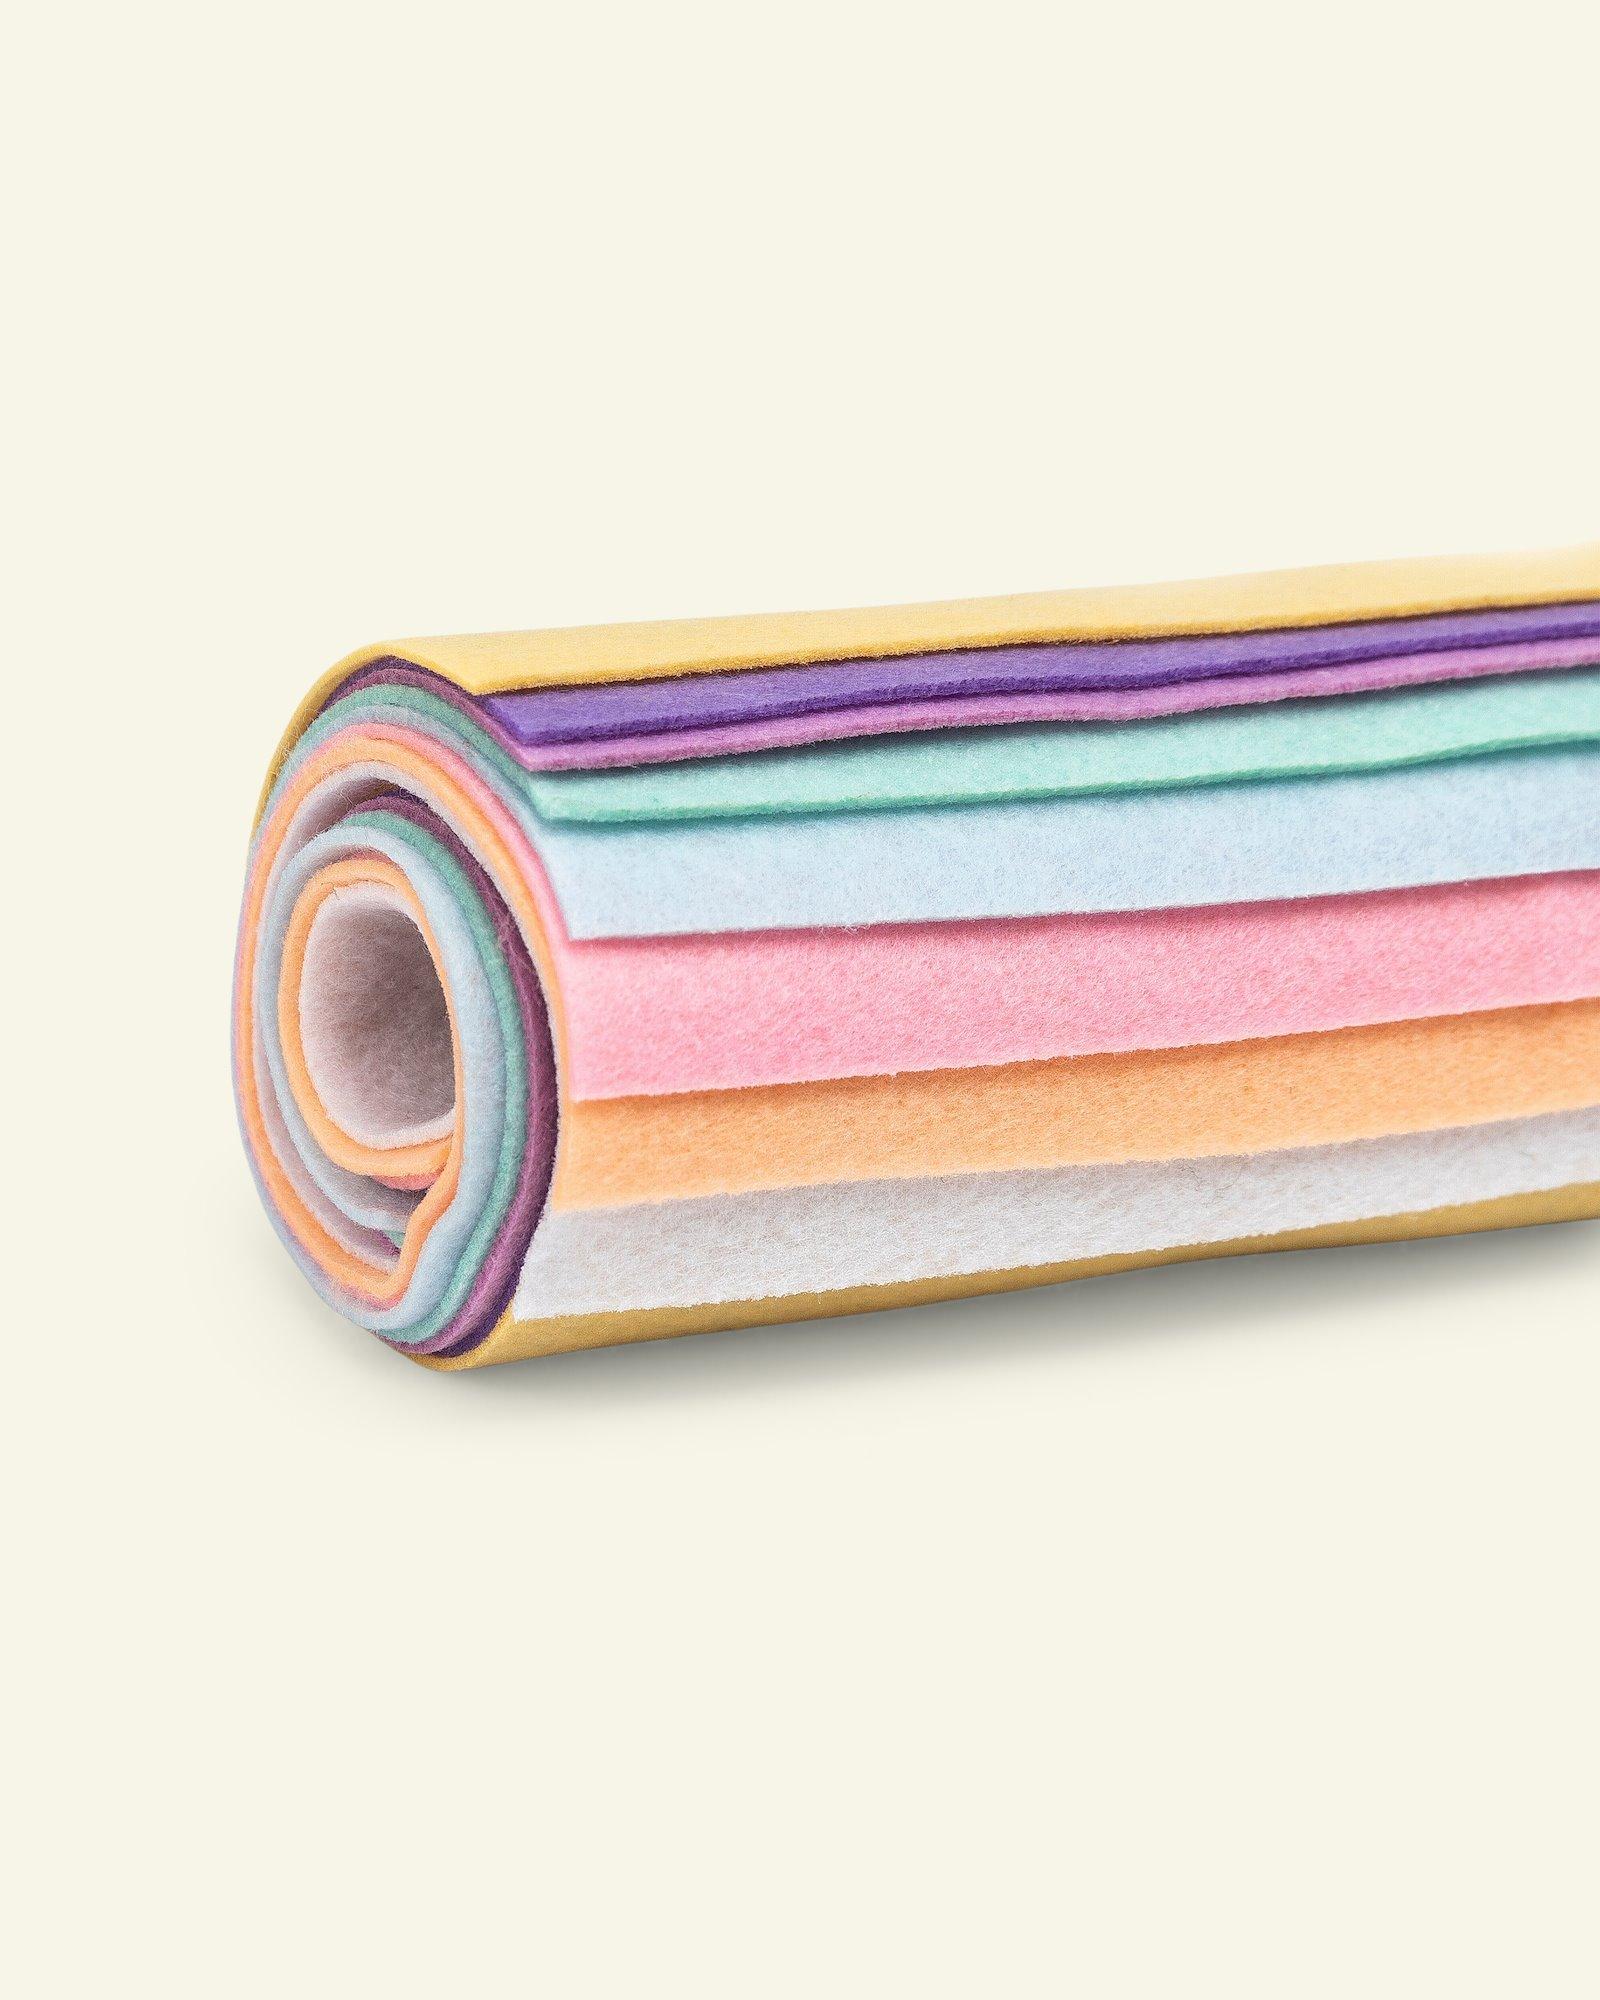 Filz 1,3mm 19,5x30cm Pastell, 8 St.